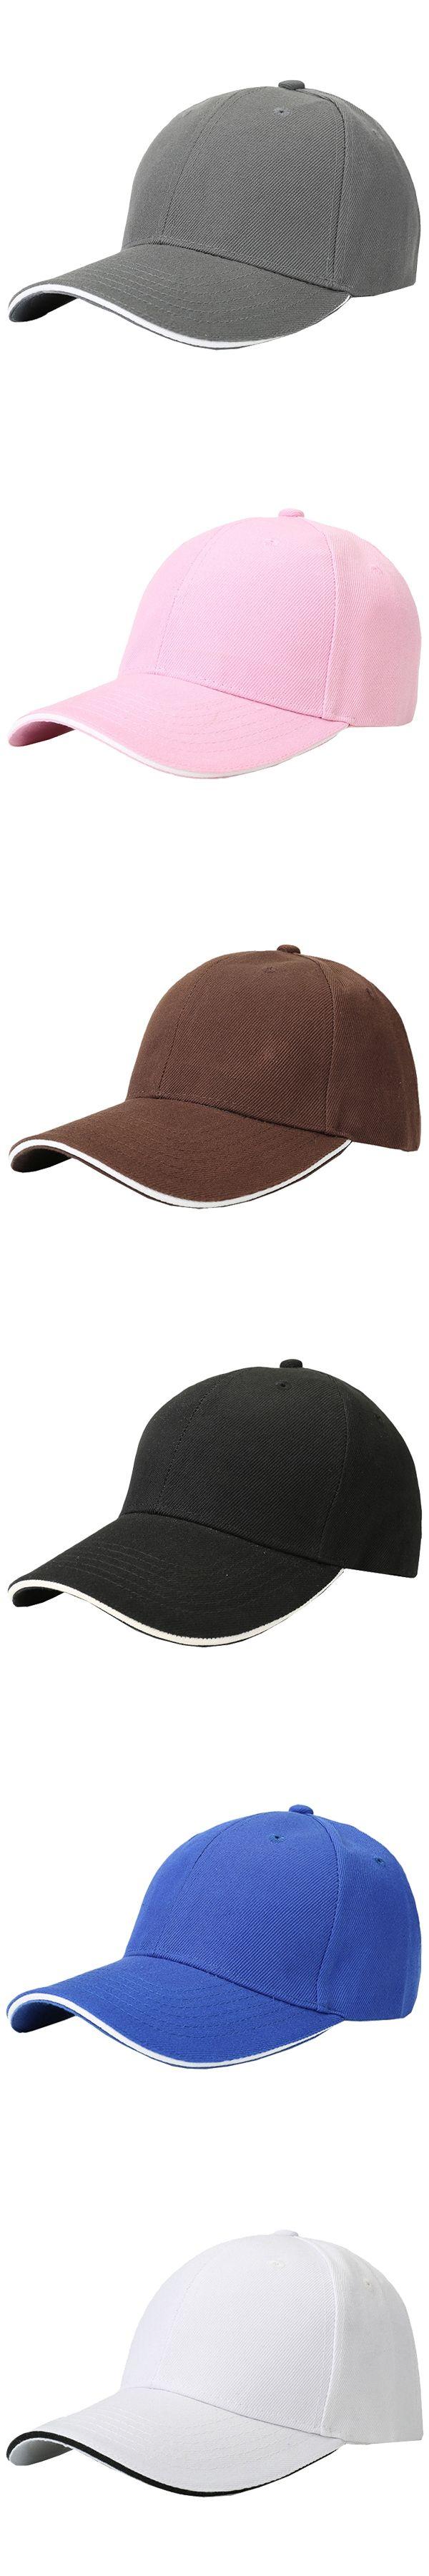 LICG Hot Casual Baseball Cap Hats Bone Snapback Skateboard Hat Pink